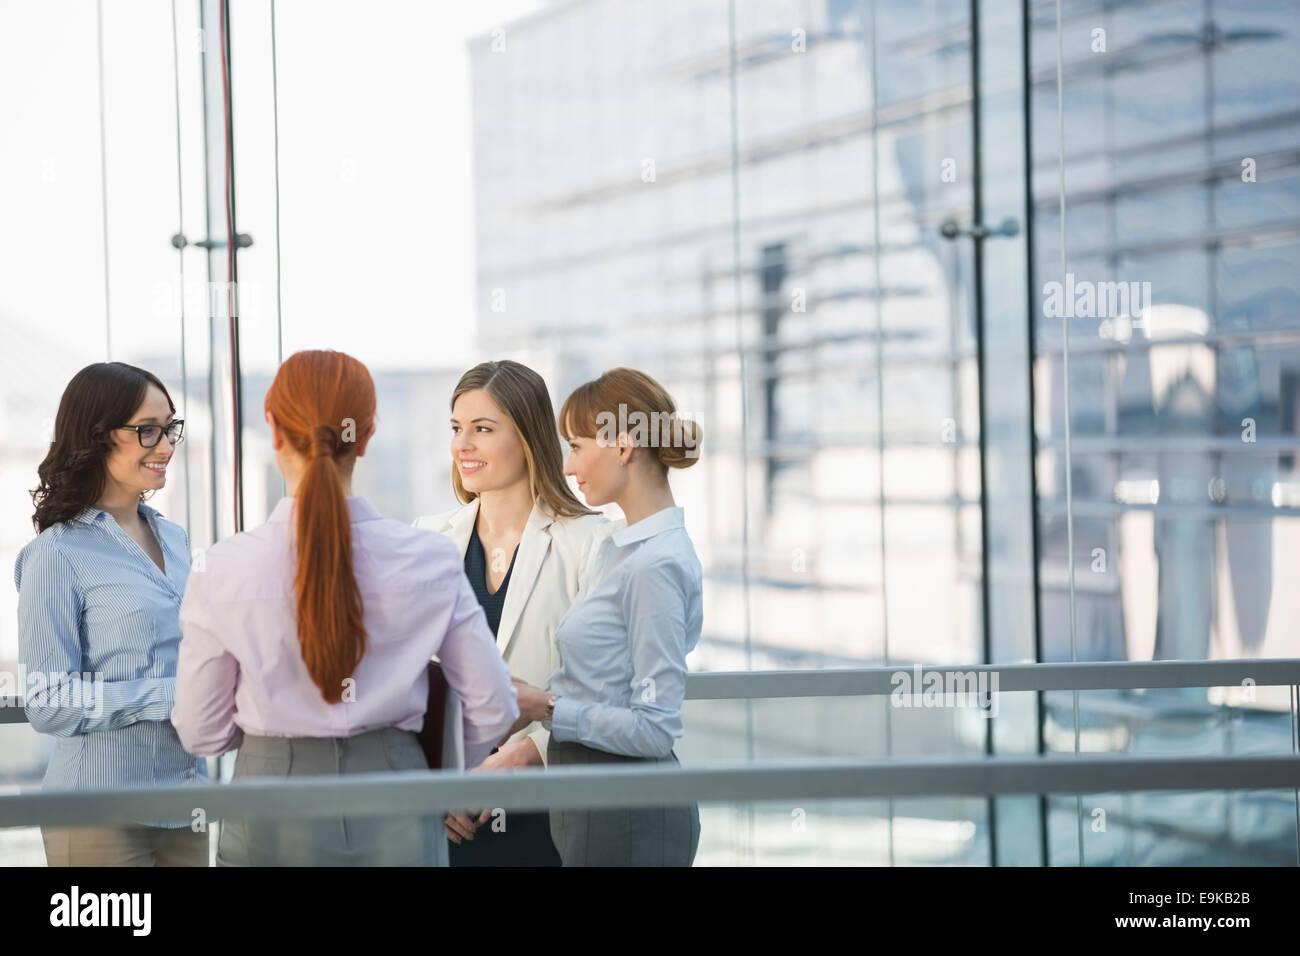 Businesswomen conversing in office - Stock Image